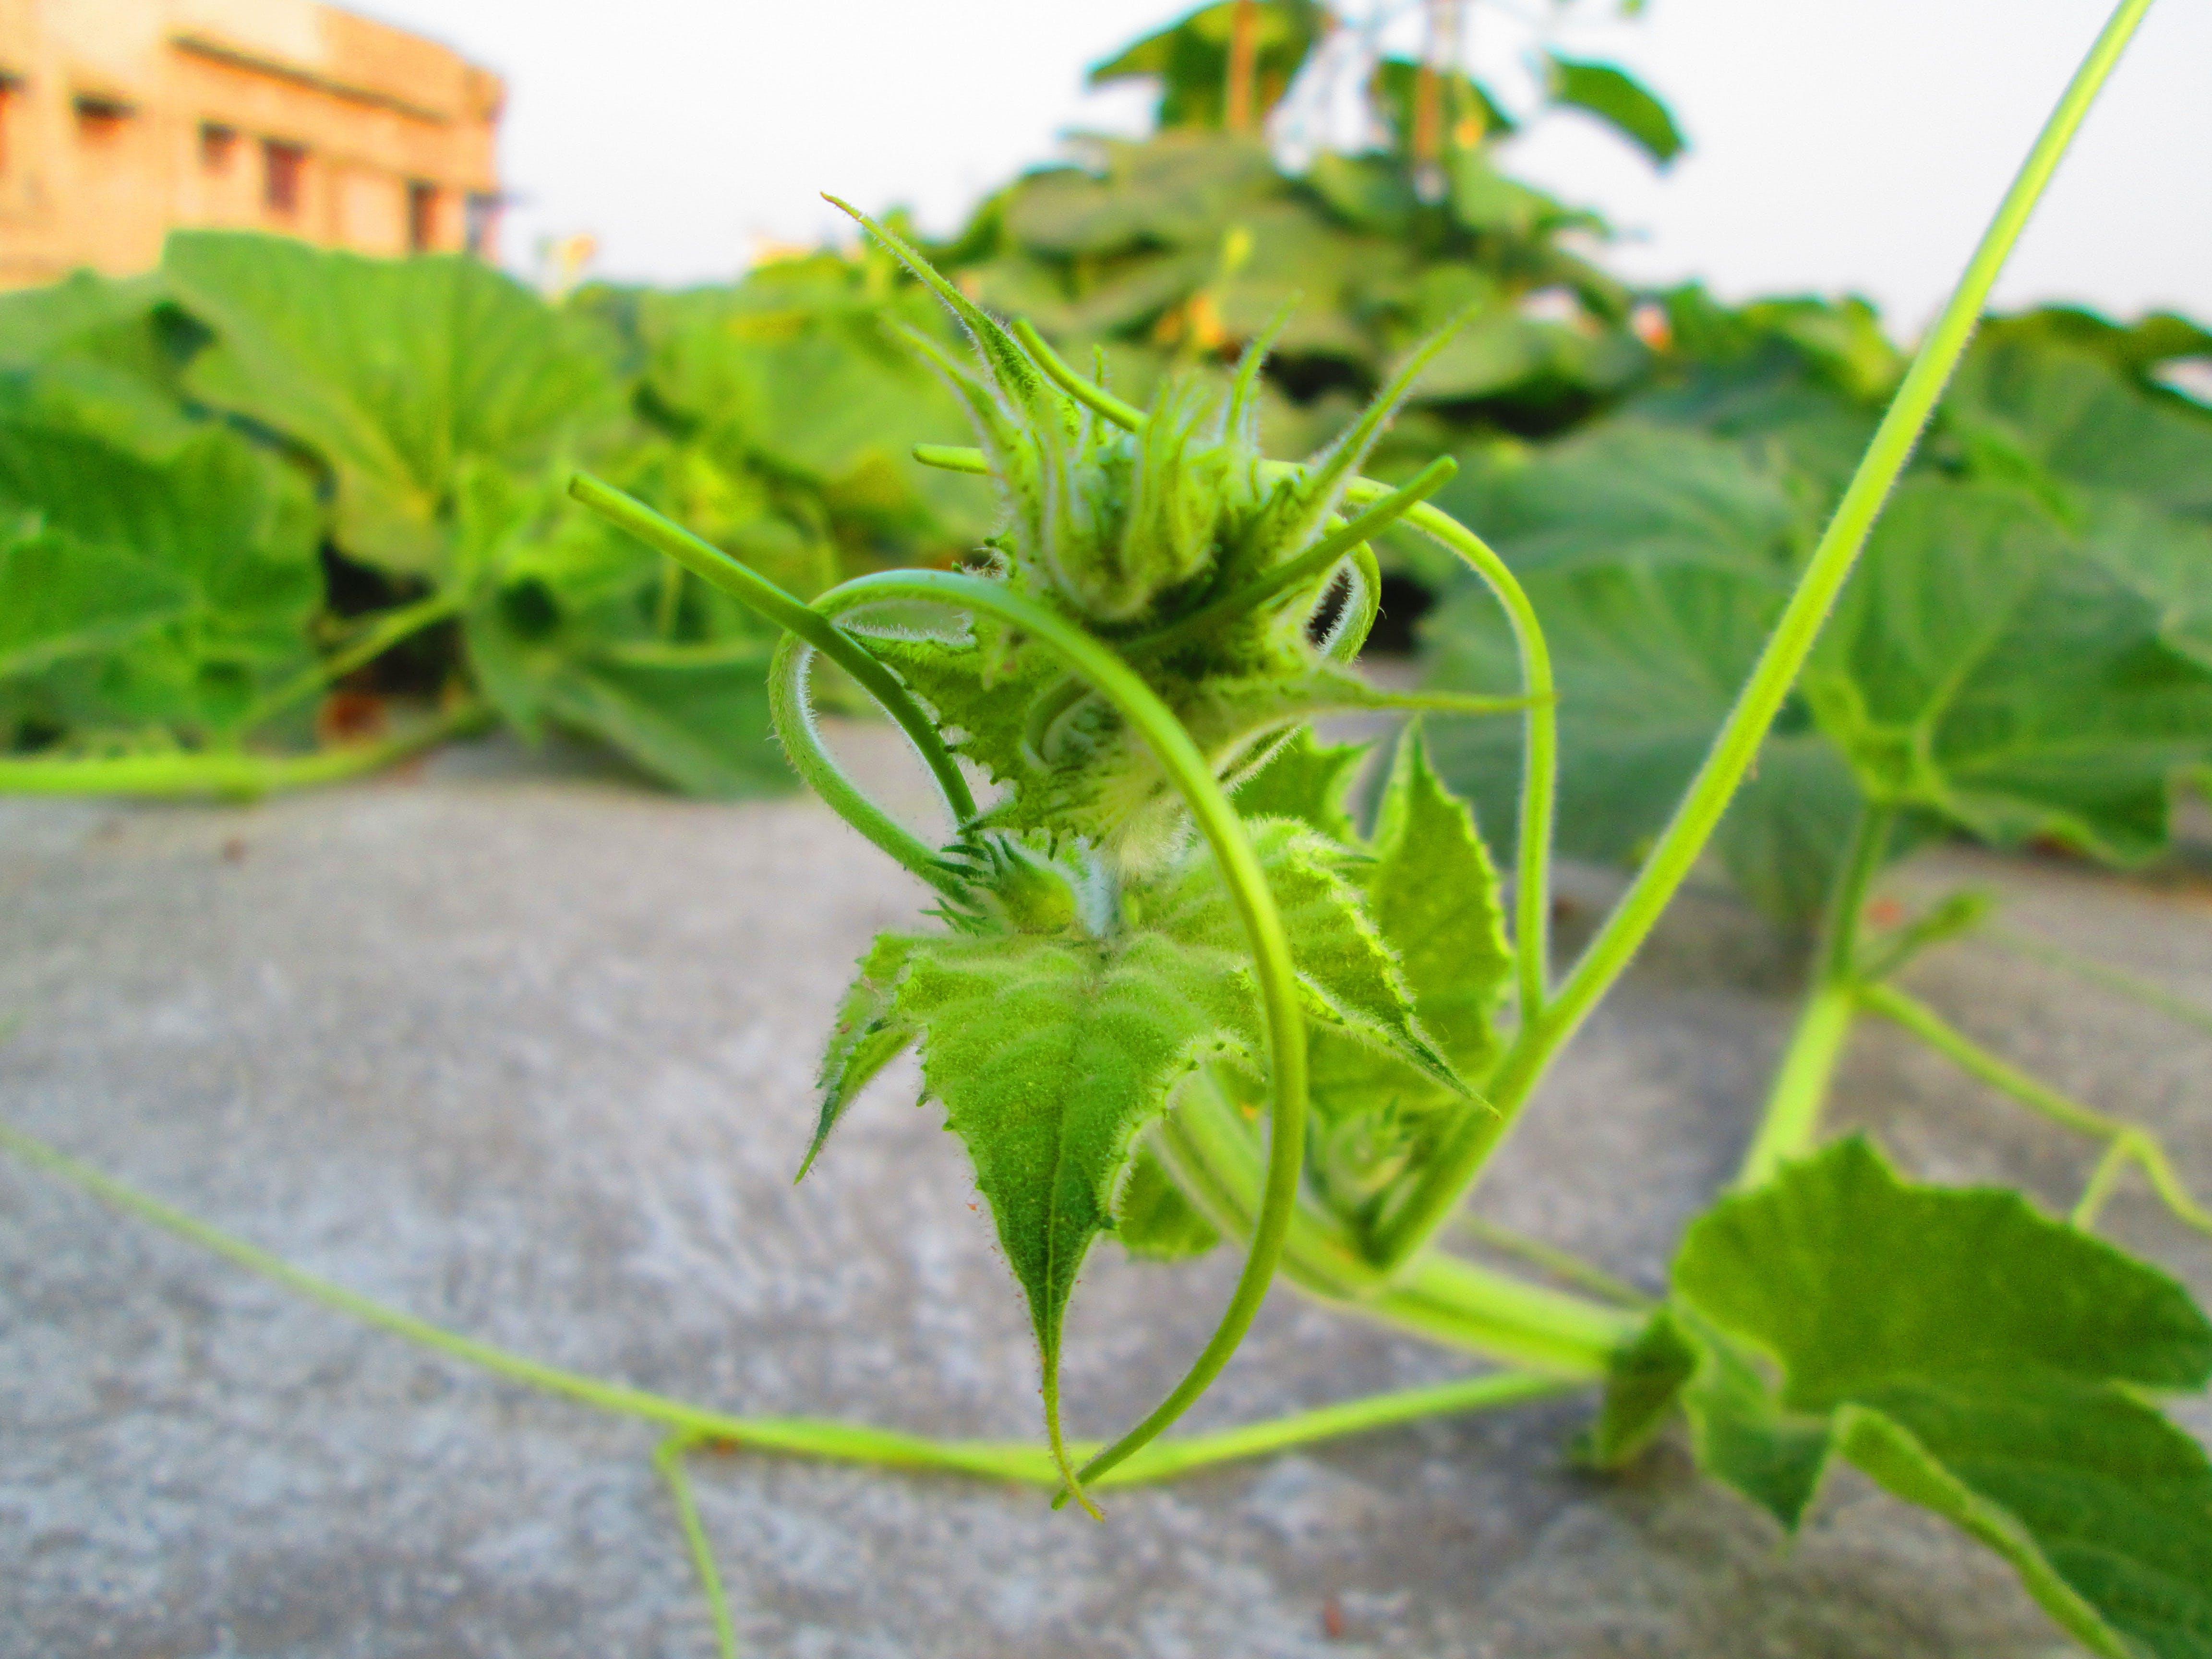 Free stock photo of close, green, macro photo, vines